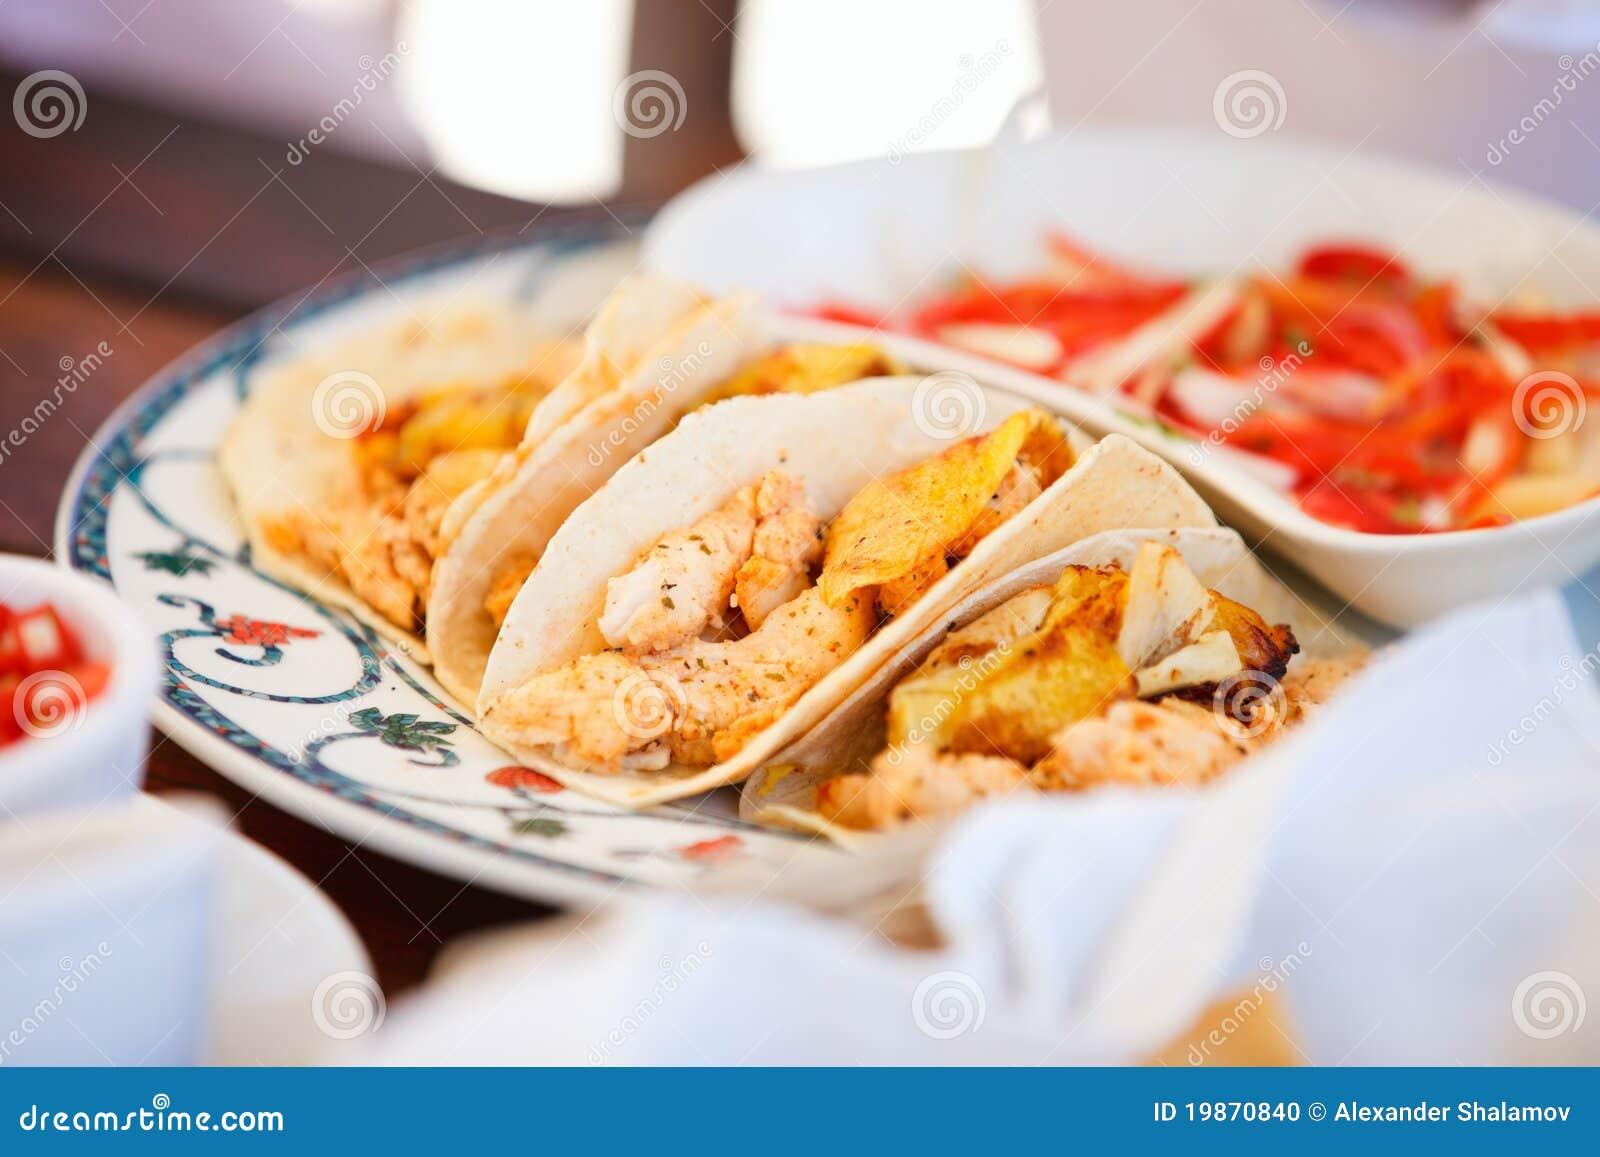 Delicious Mexican Tacos Stock Photo - Image: 19870840